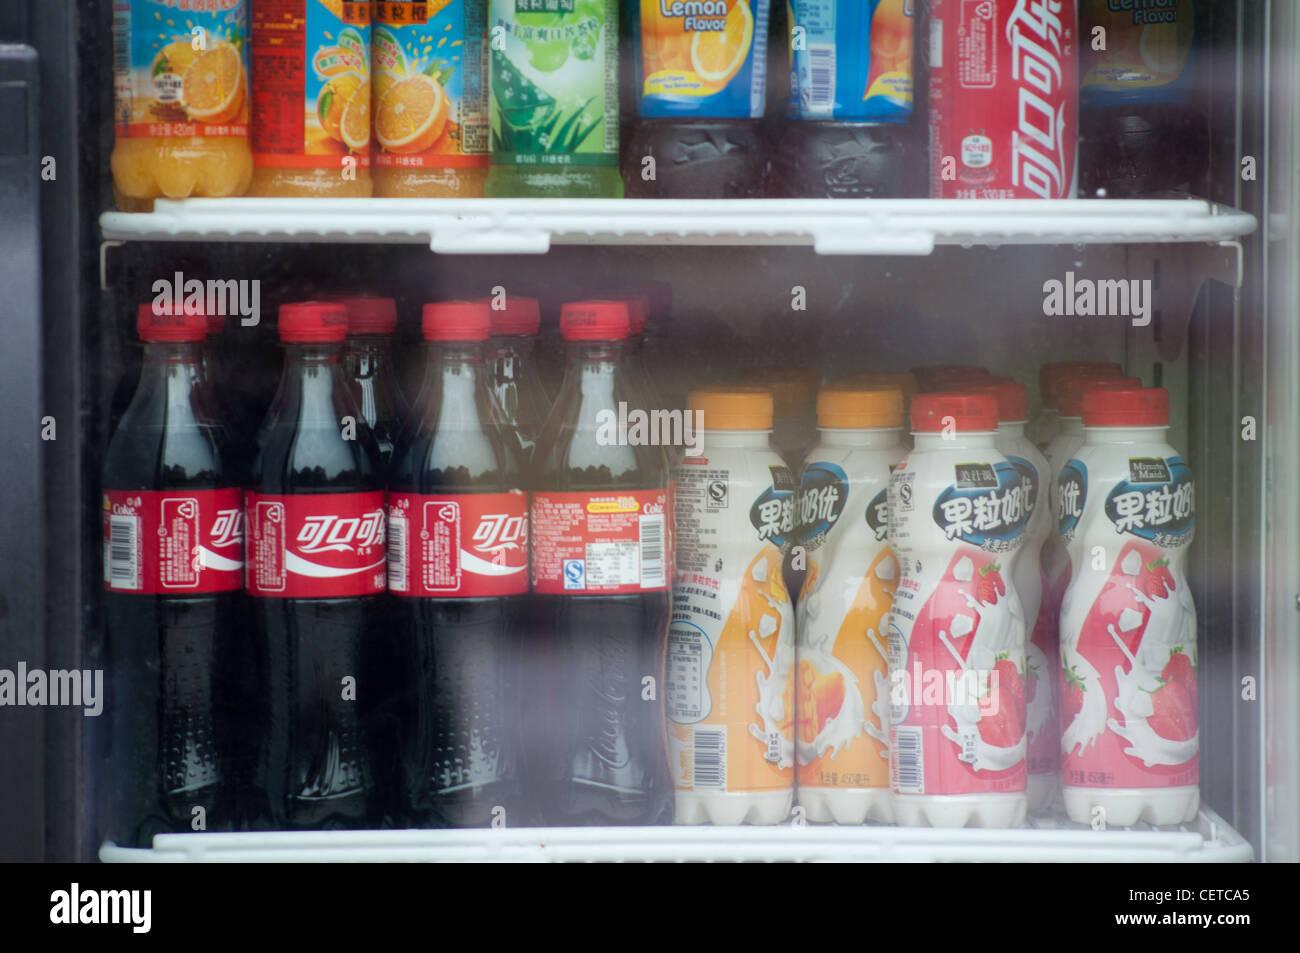 Kühlschrank Coco Cola : Coca cola getränk im kühlschrank stockfoto bild  alamy